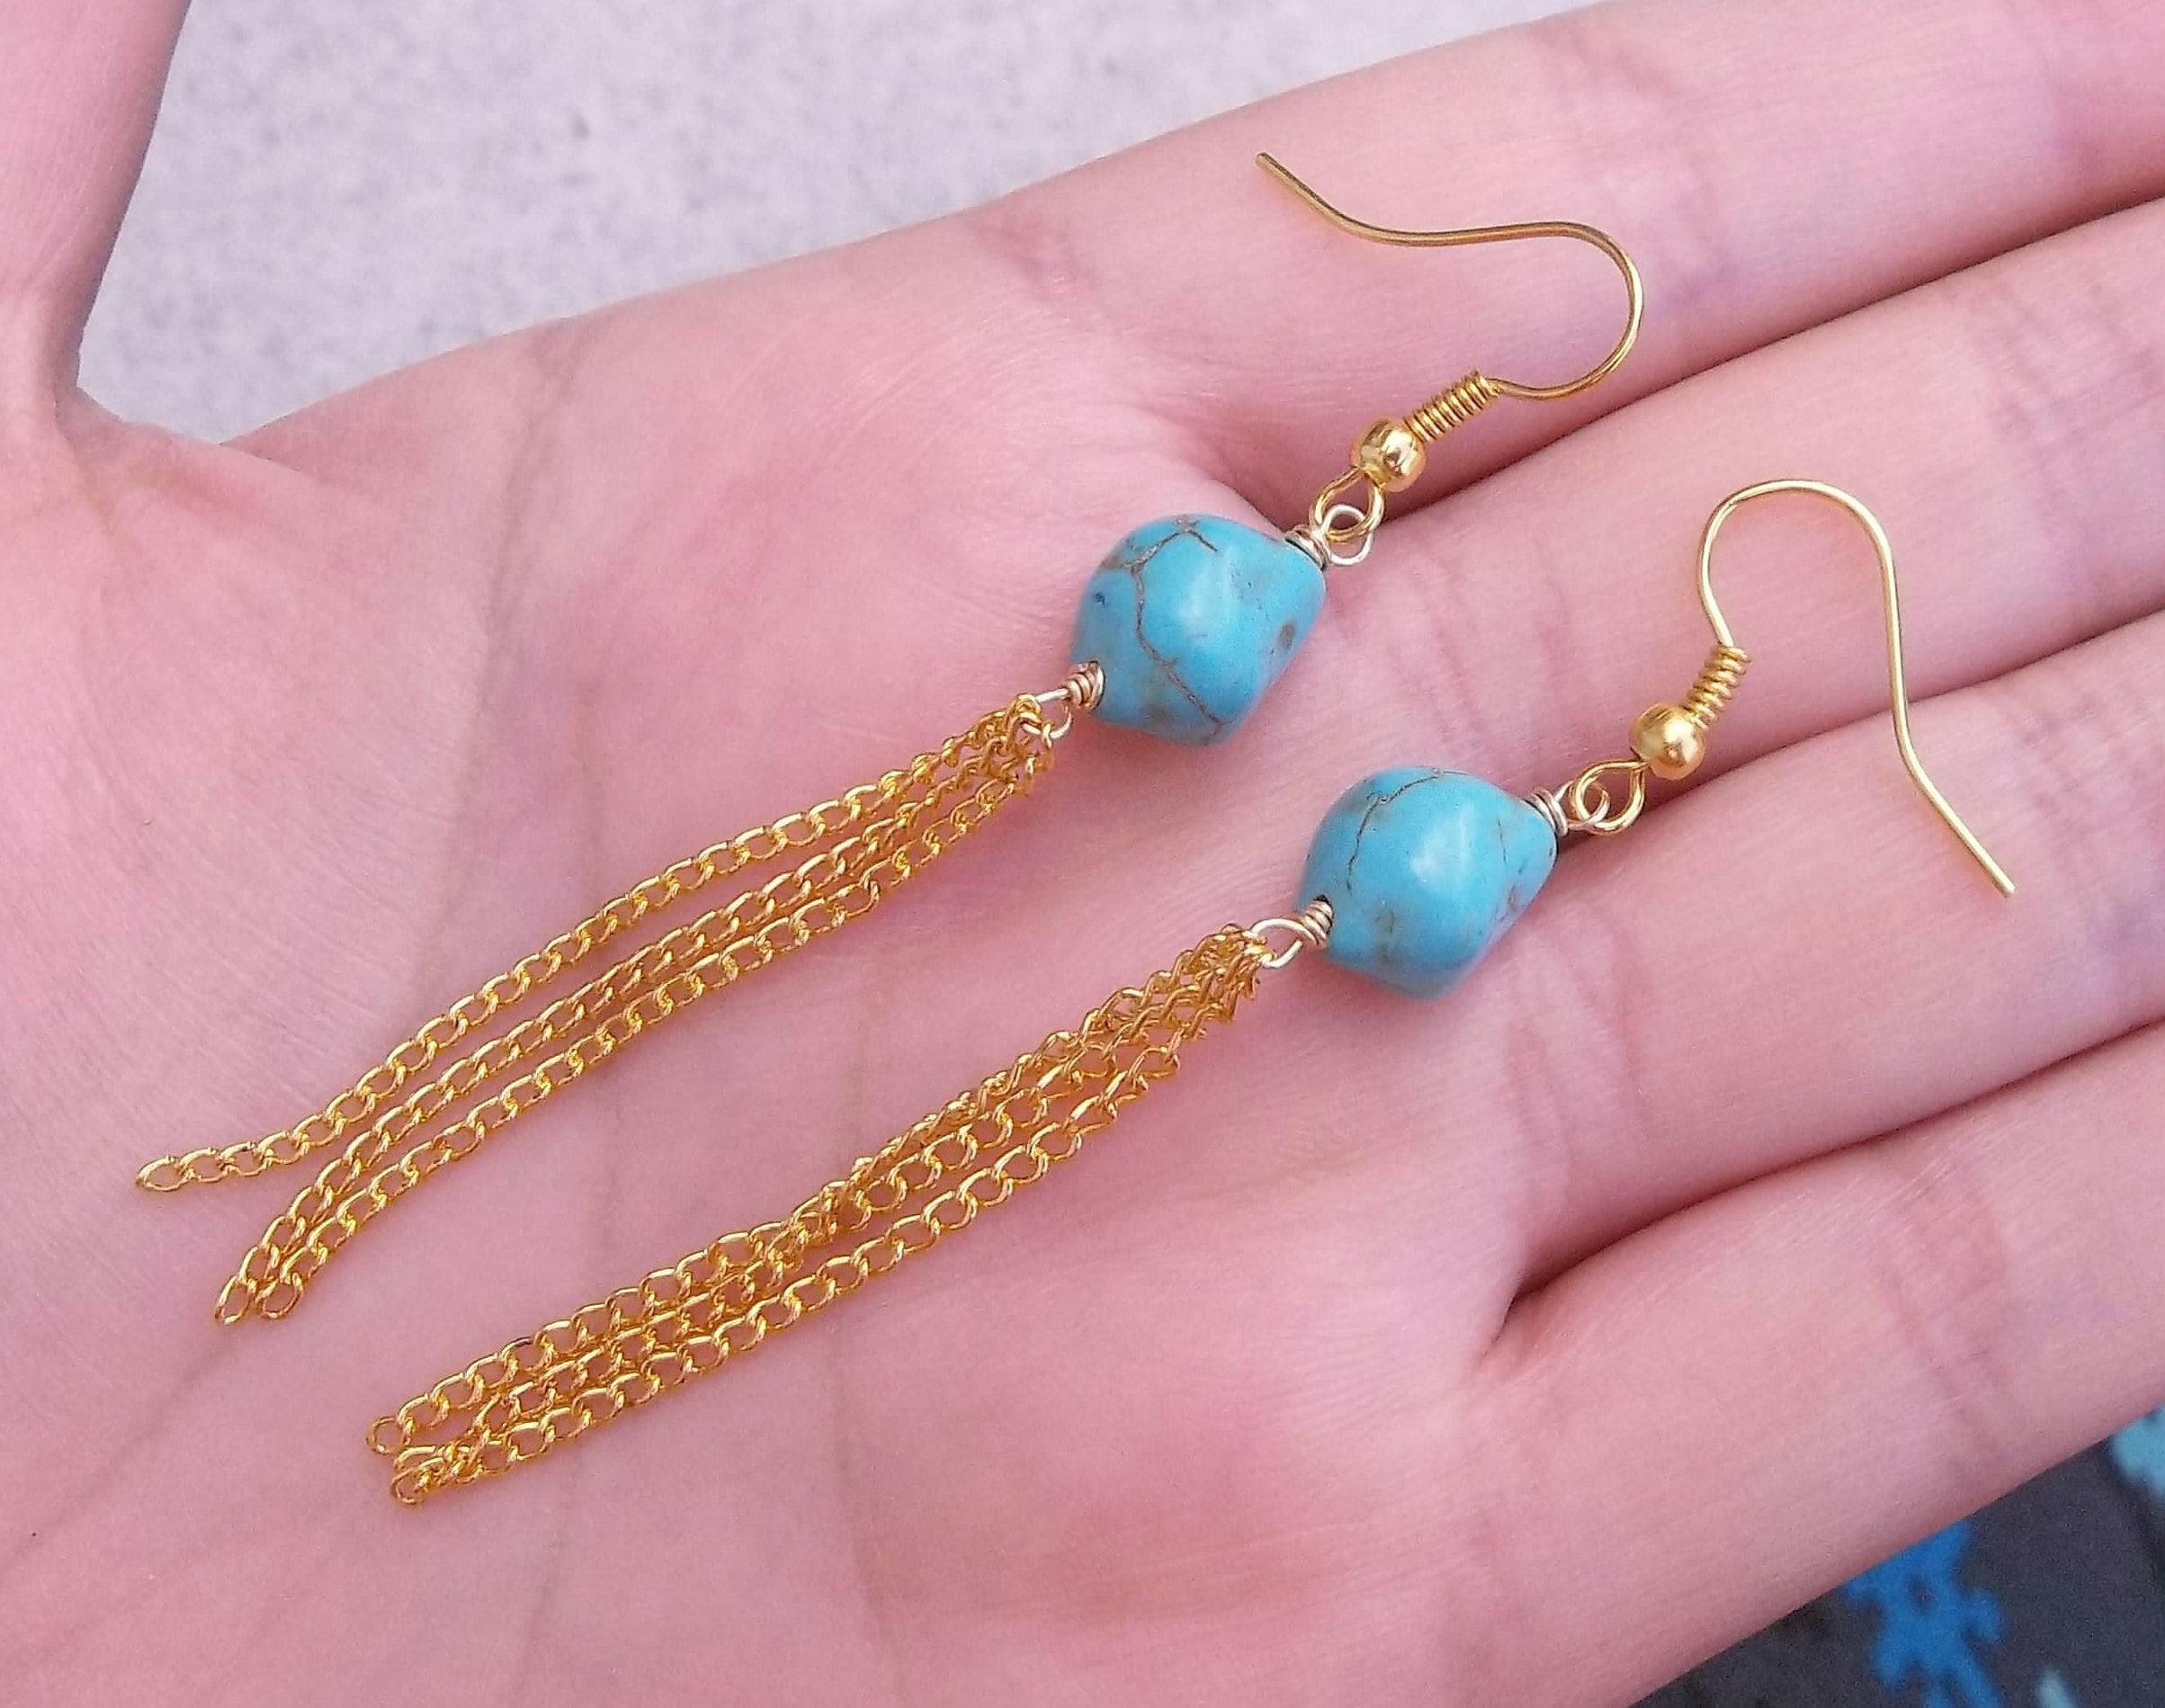 Real Natural Triangle Diamond Shaped Blue Turquoise Gemstone Stone Rock Retro Vintage Bohemian Simple Silver Drop Dangle Earrings 2.3